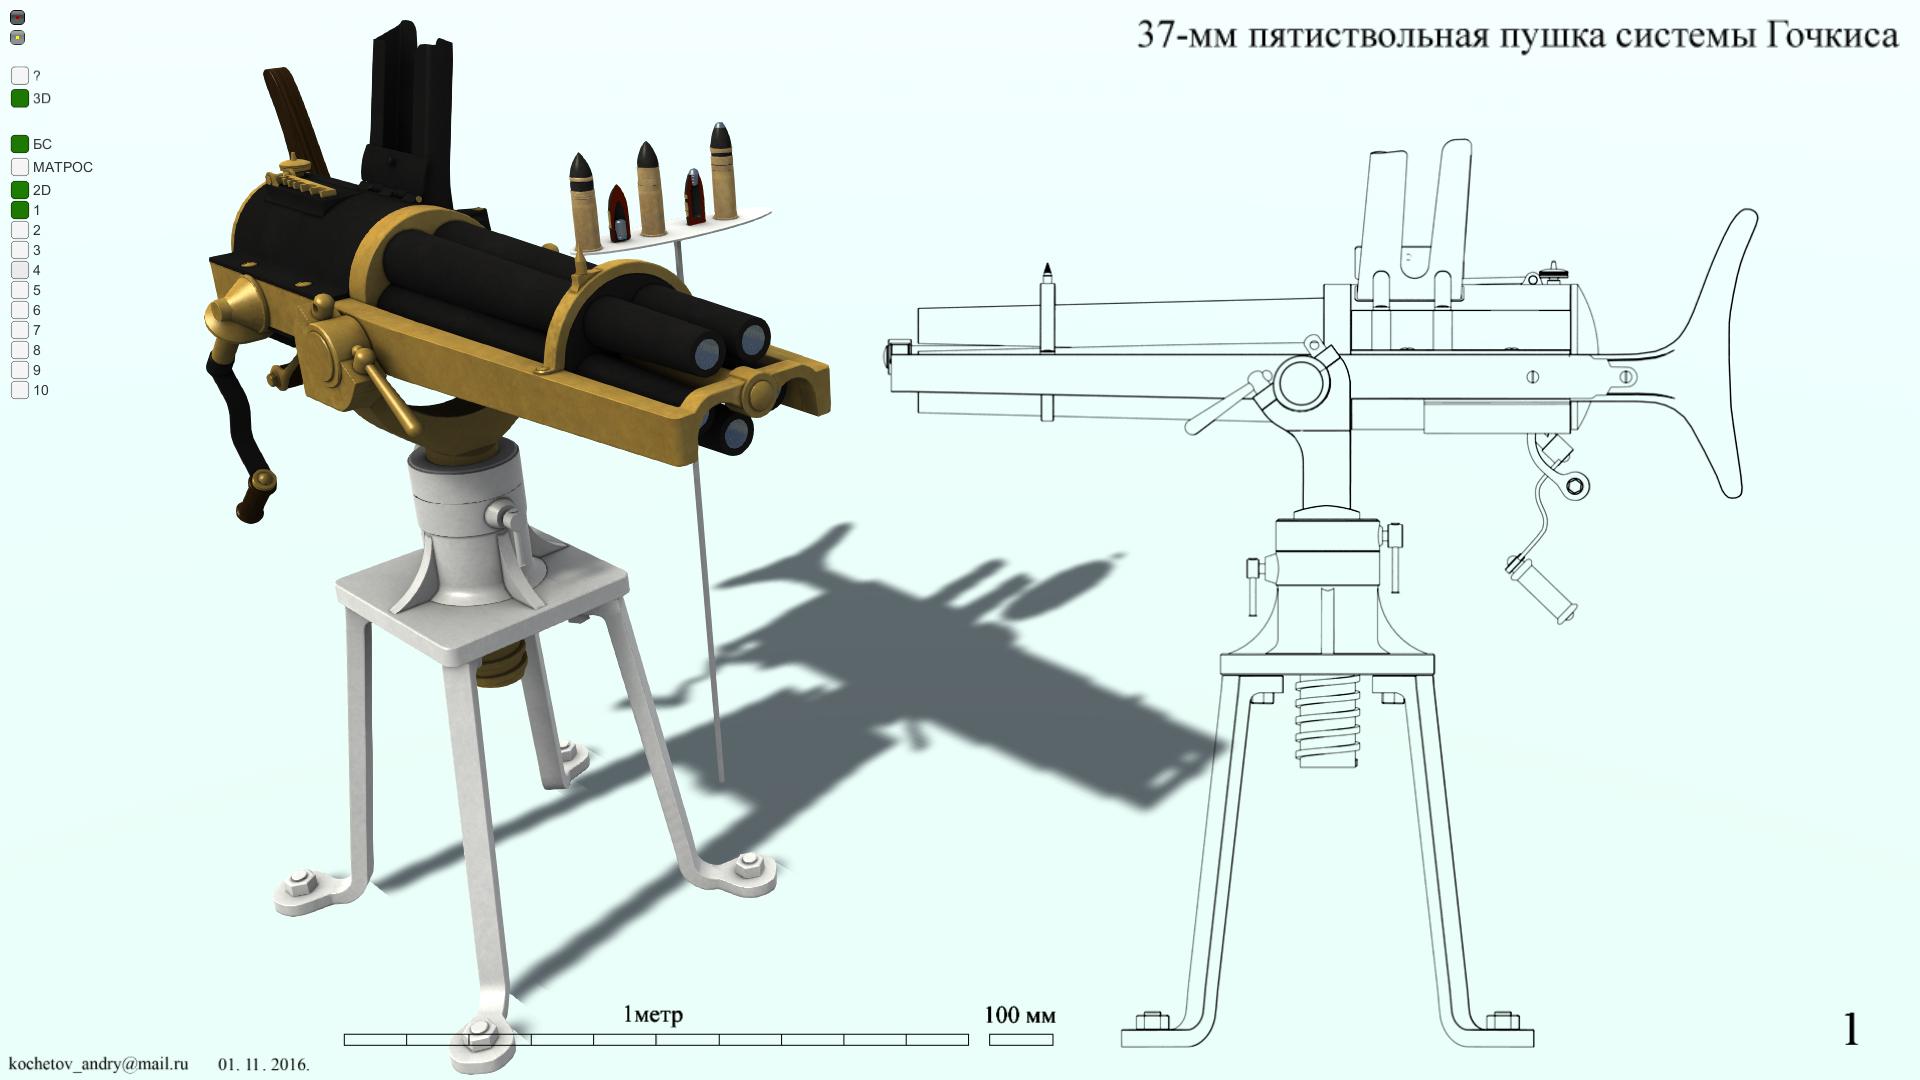 37мм пятиствольная пушка Гочкиса.jpg